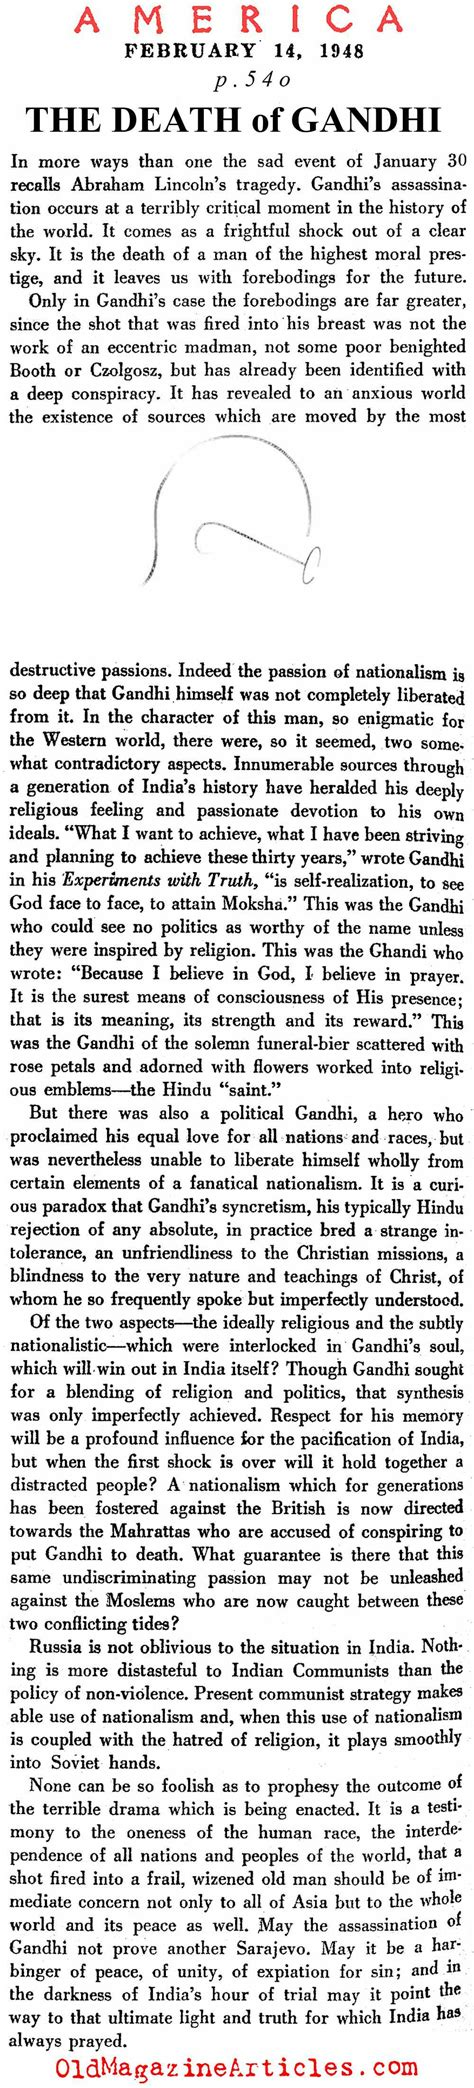 mahatma gandhi biography article article on mahatma gandhi pdf the ideal school of the